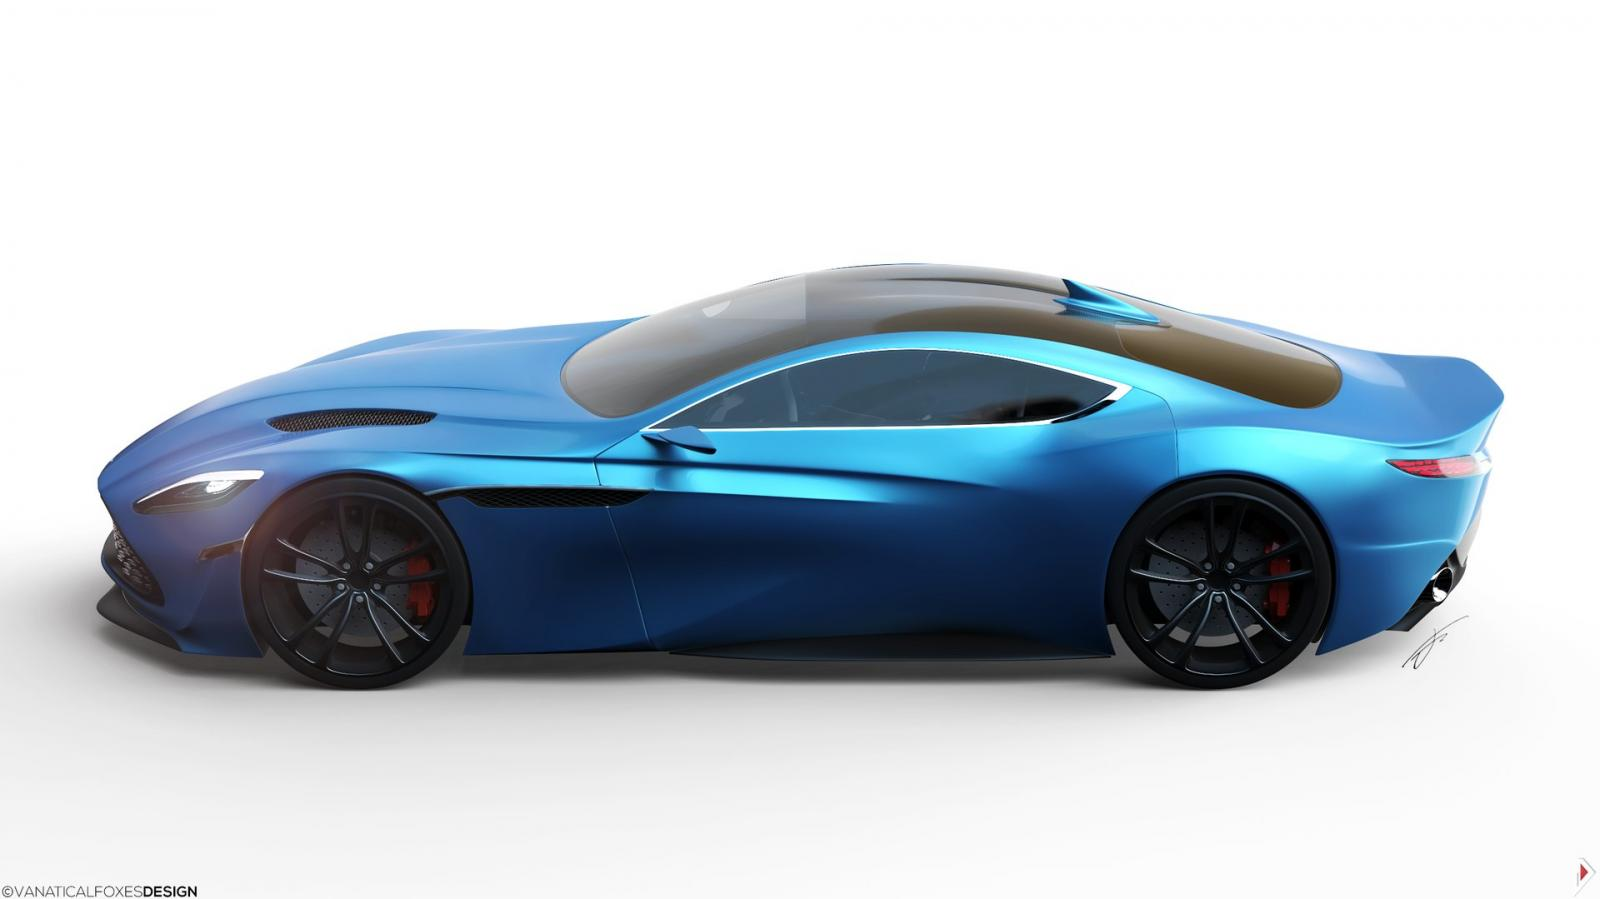 ASTON MARTIN DB11 Concept Design - Rendering